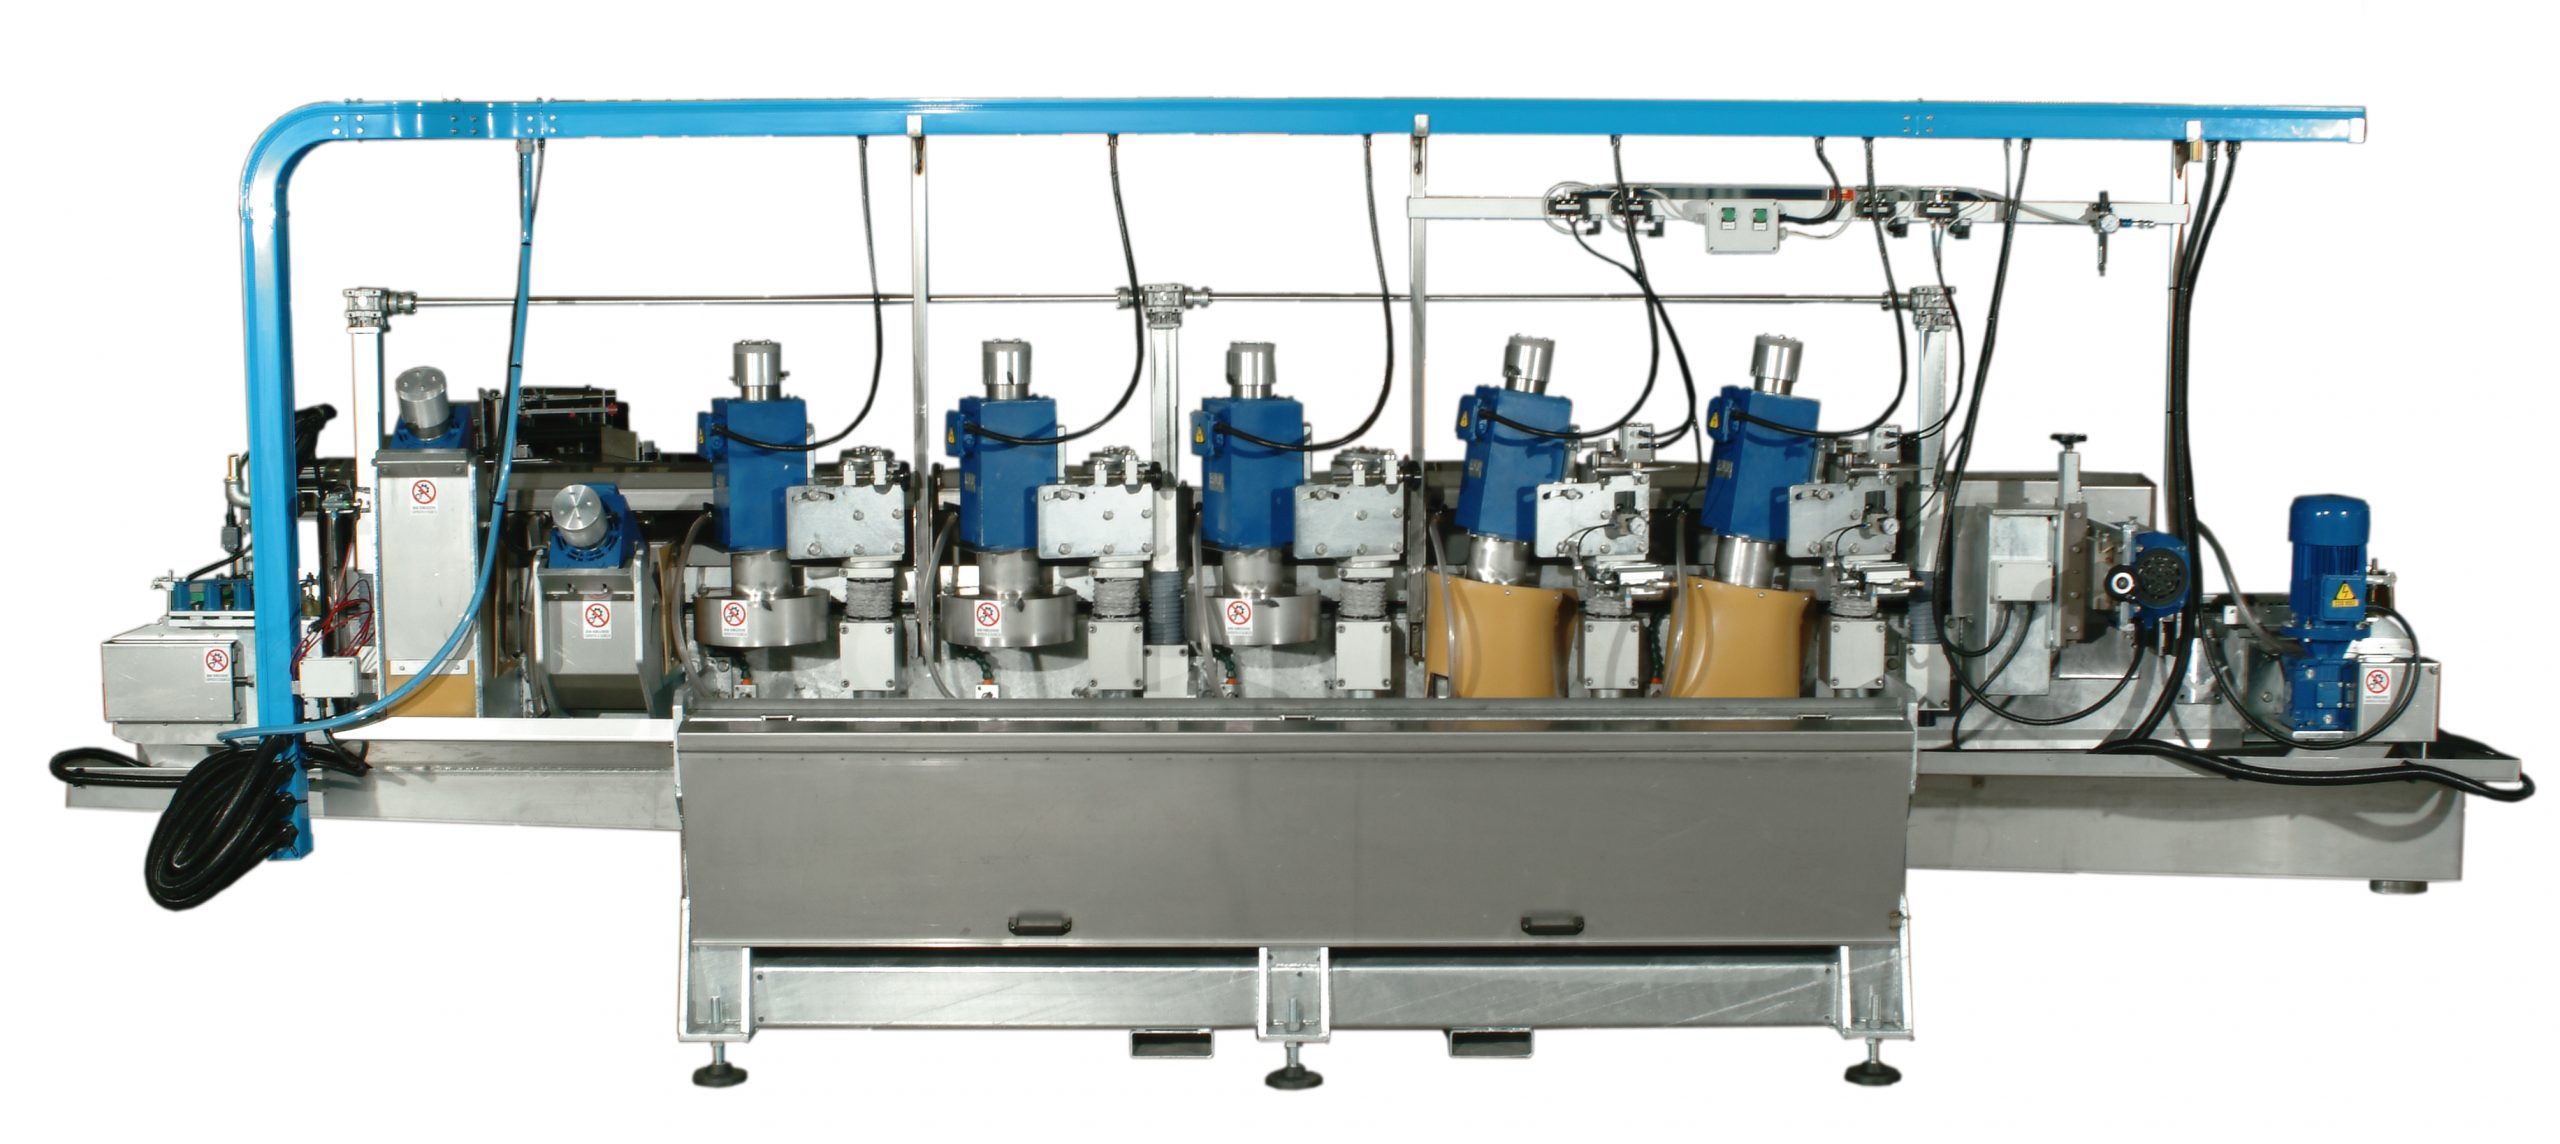 Cosmac SM7 Profiliermaschine